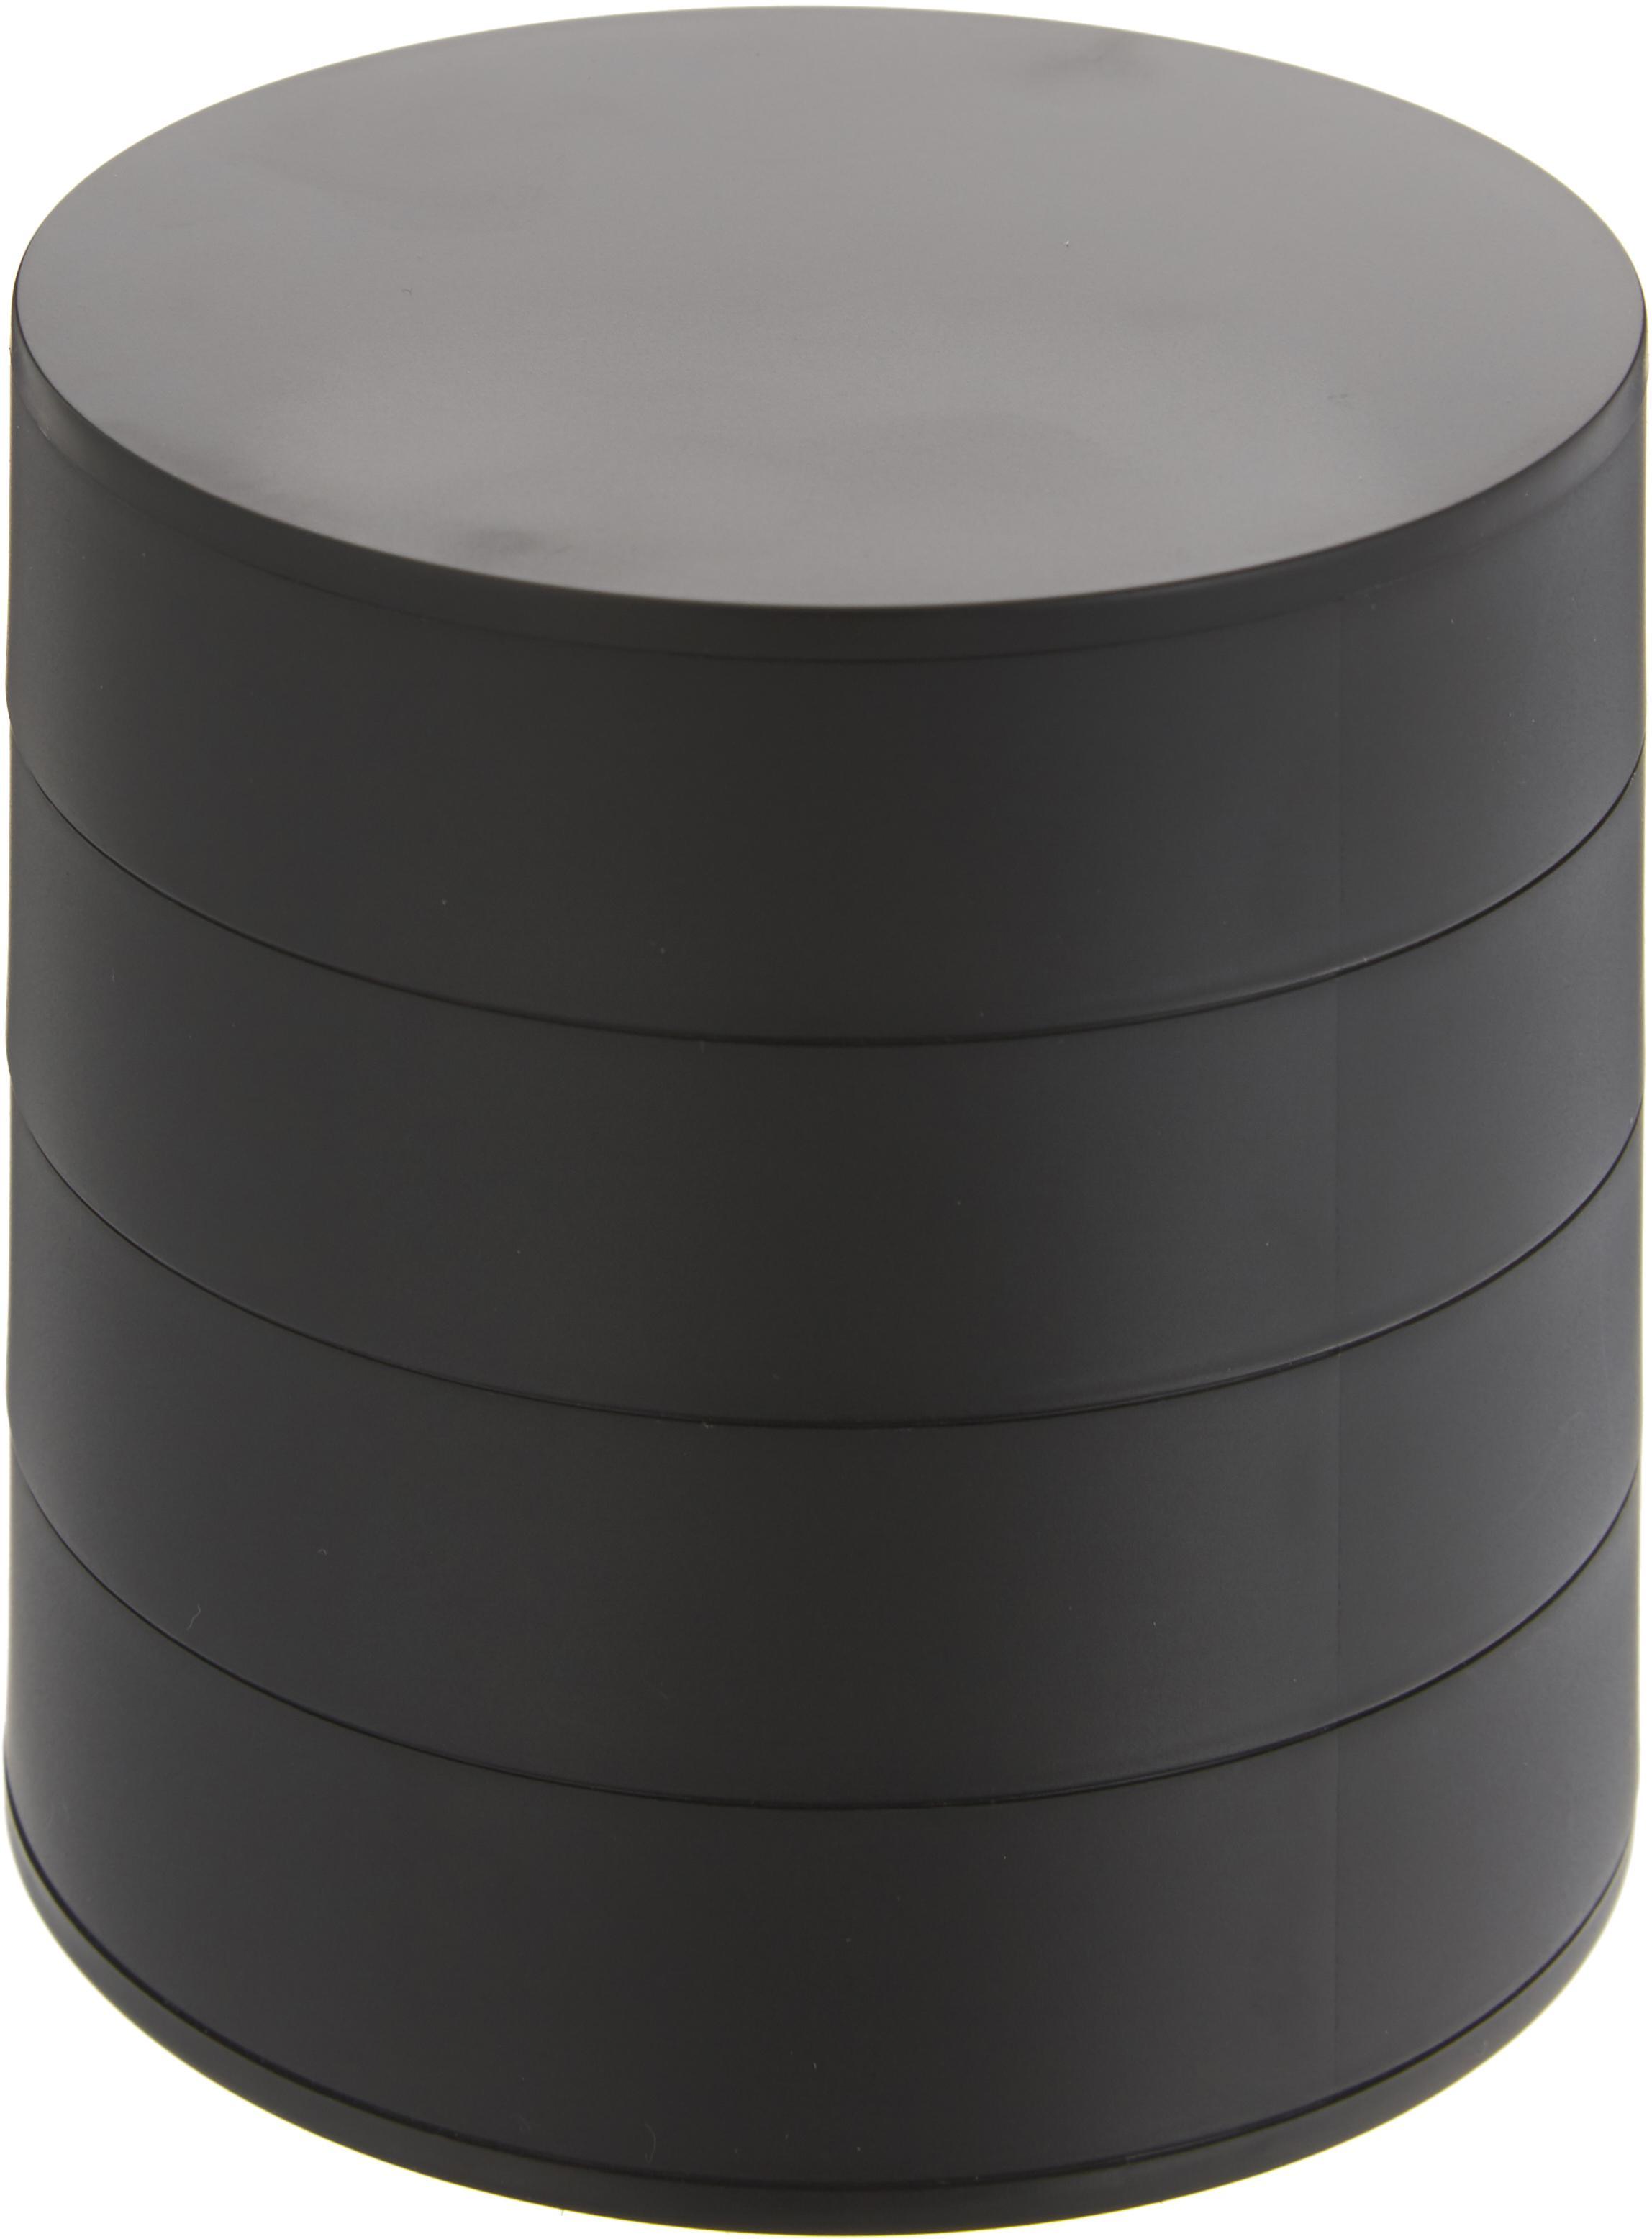 Joyero Tower, Interior: terciopelo de poliéster, Negro, Ø 10 x Al 10 cm